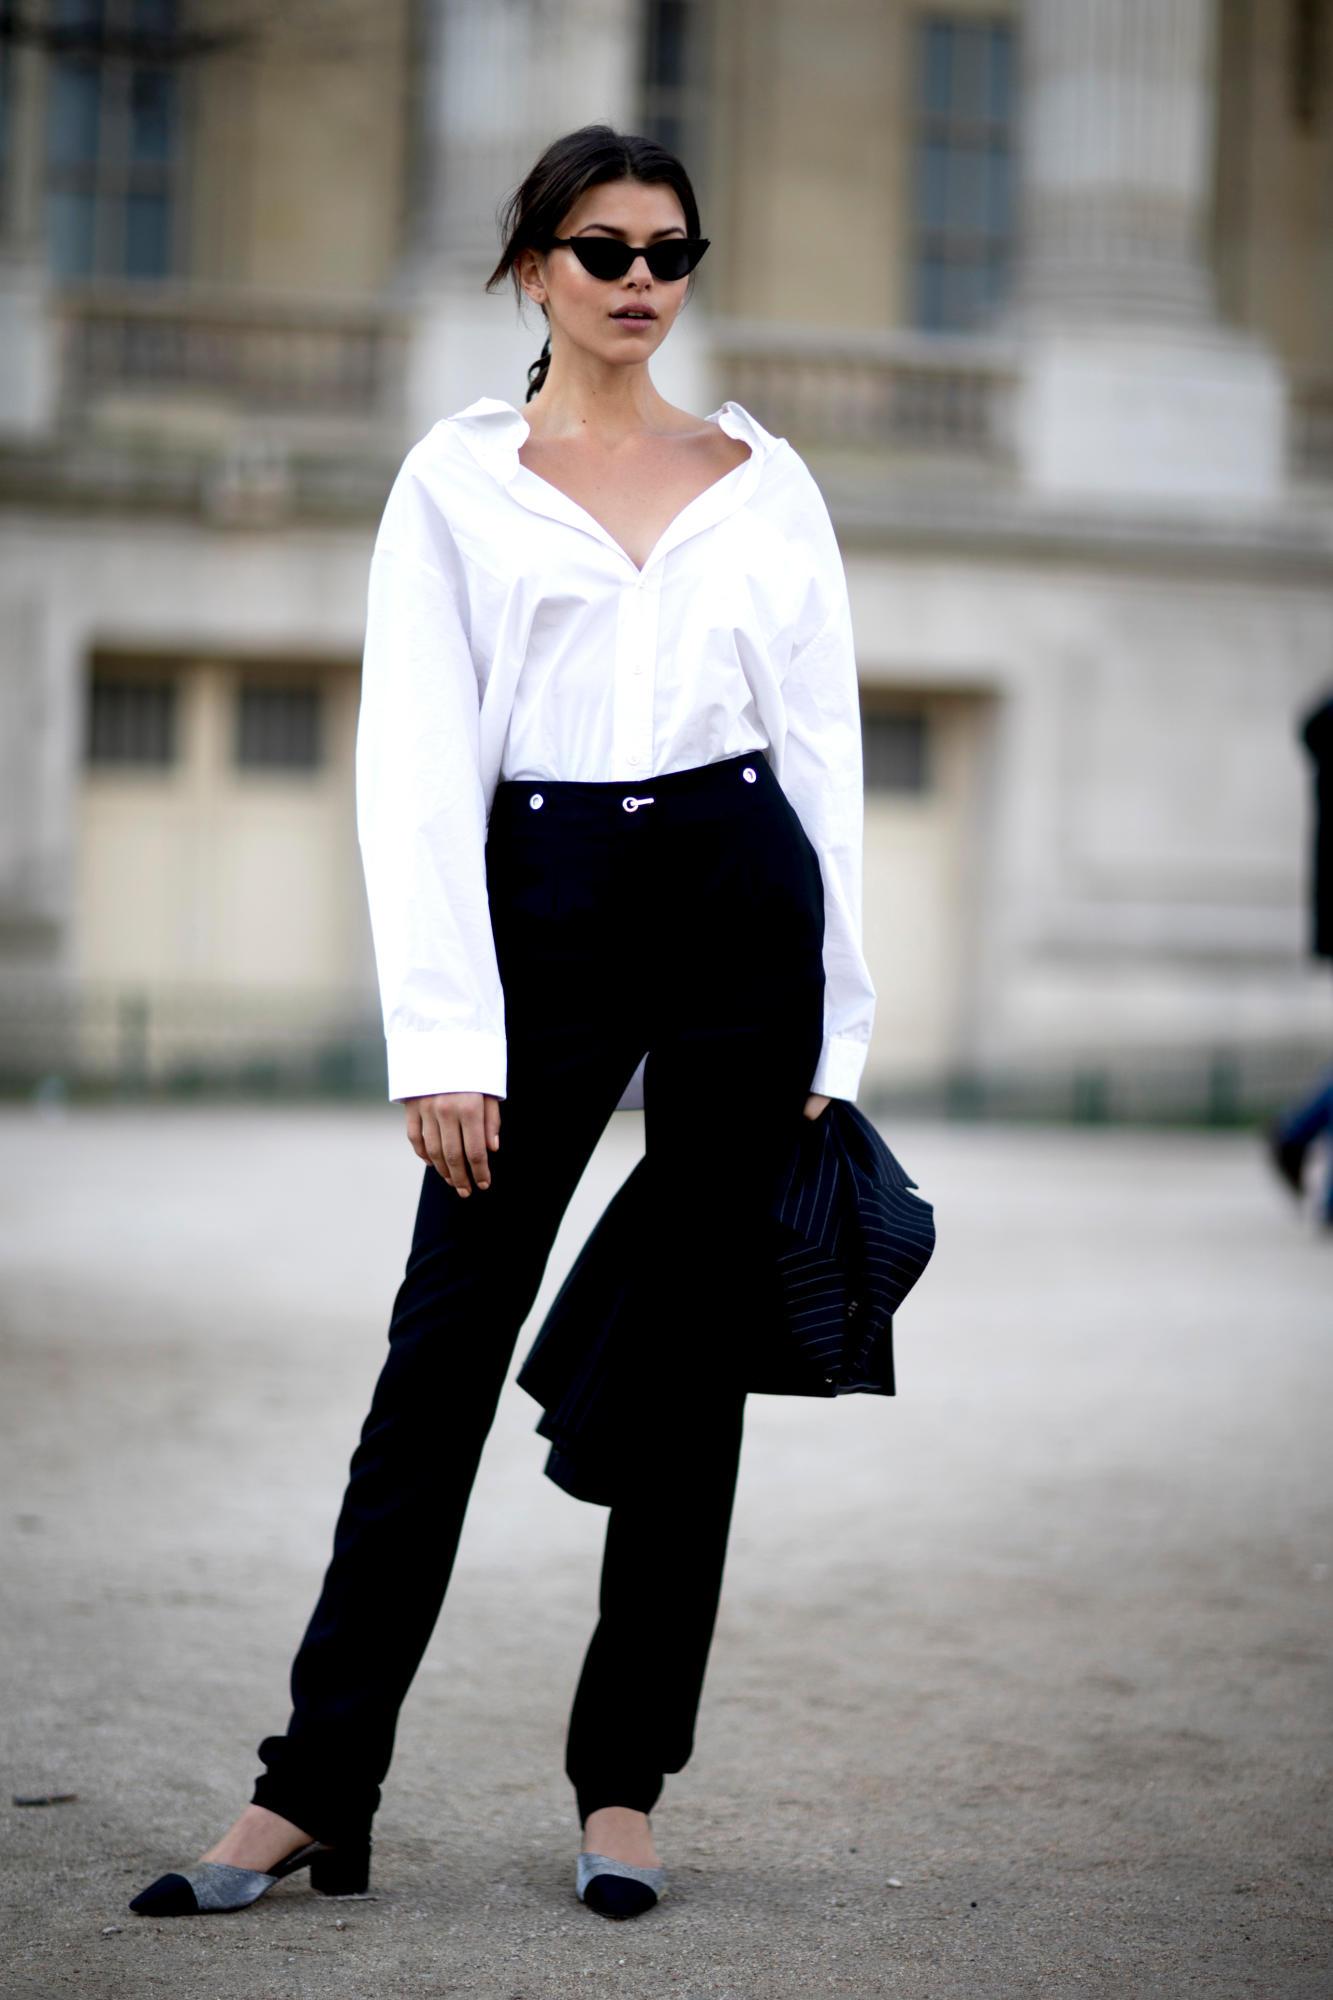 paris-fashion-week-street-style-fall-2018-day-5-45.jpg